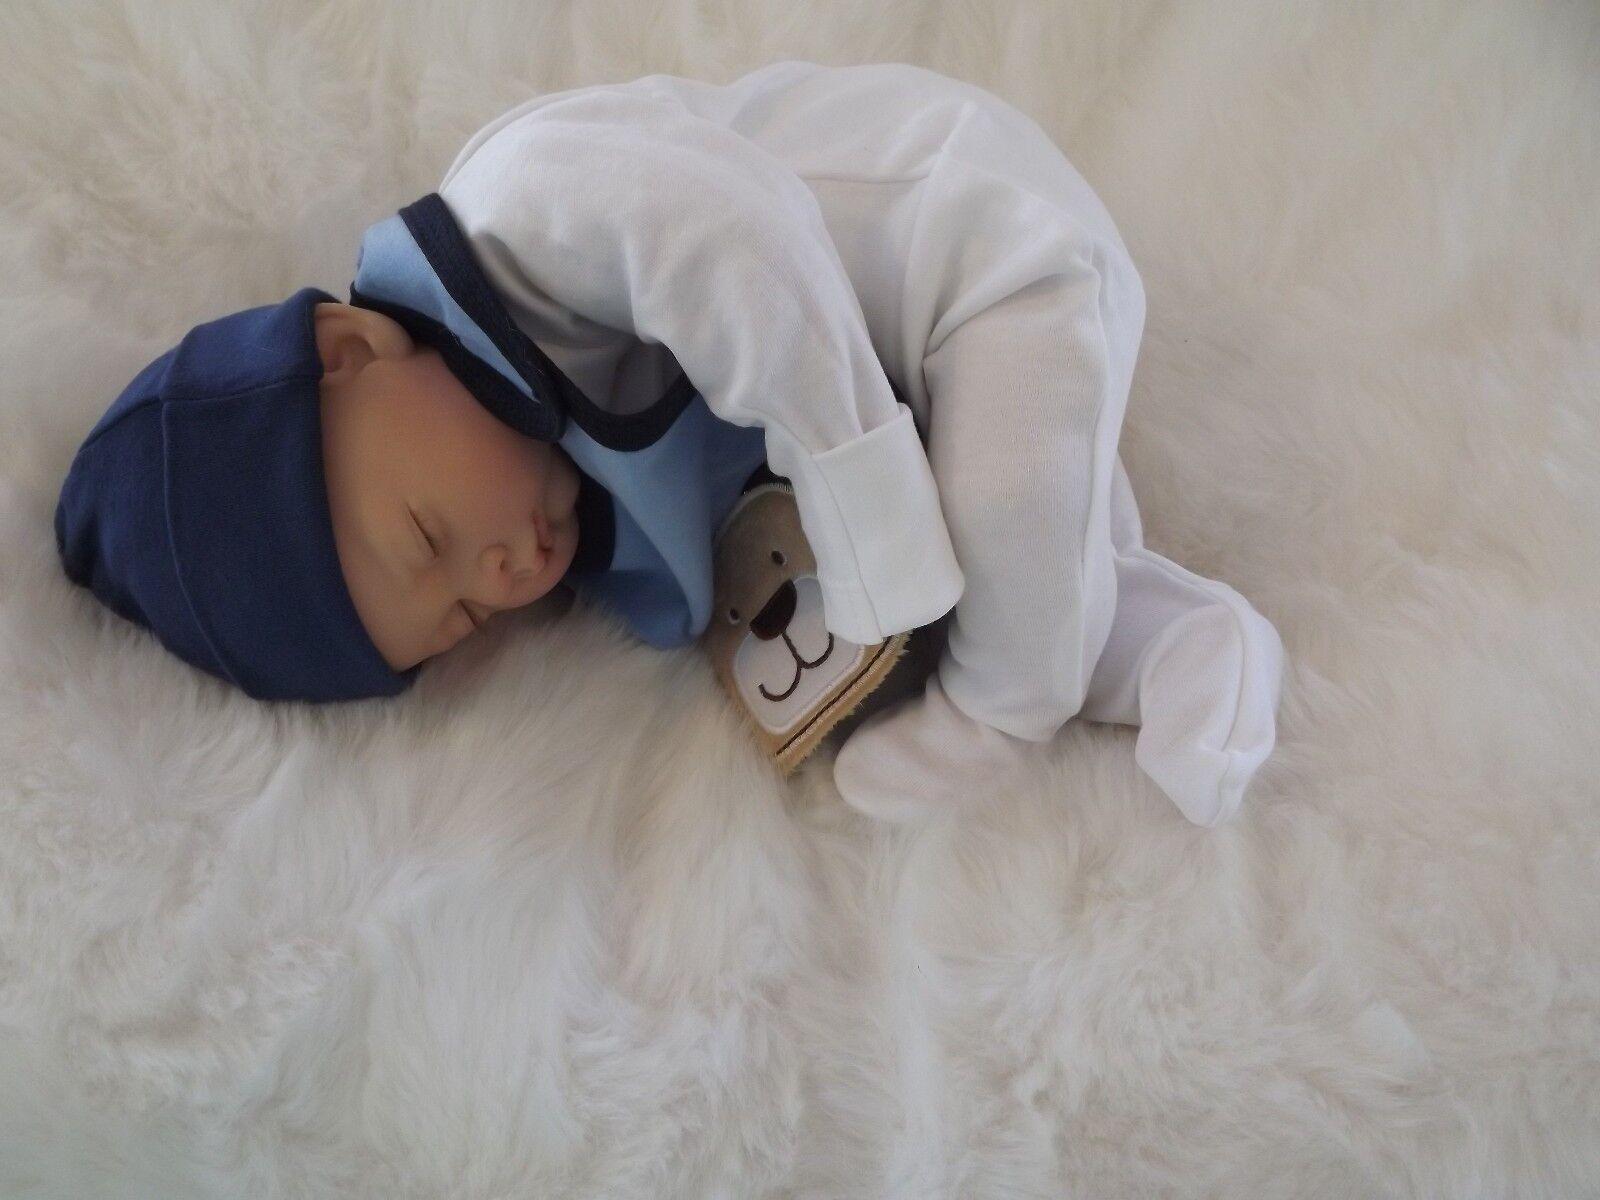 DOMINIC BABY BOY BOS LifeGröße Realistic Reborn Doll Girls Mum Birthday Xmas